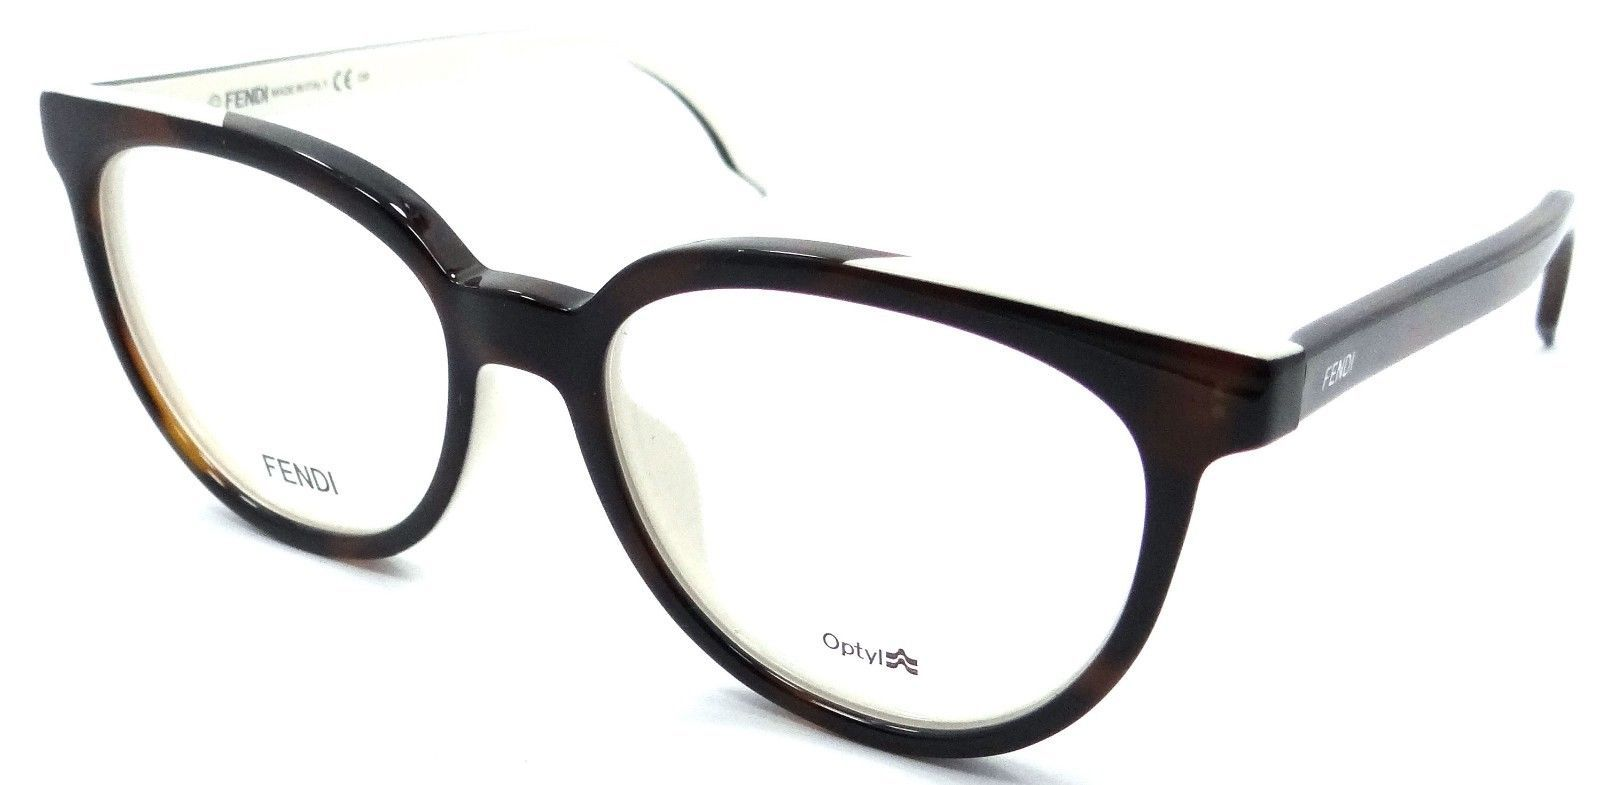 94779e56817 Fendi Rx Eyeglasses Frames FF 0122 F MIY and 50 similar items. 57